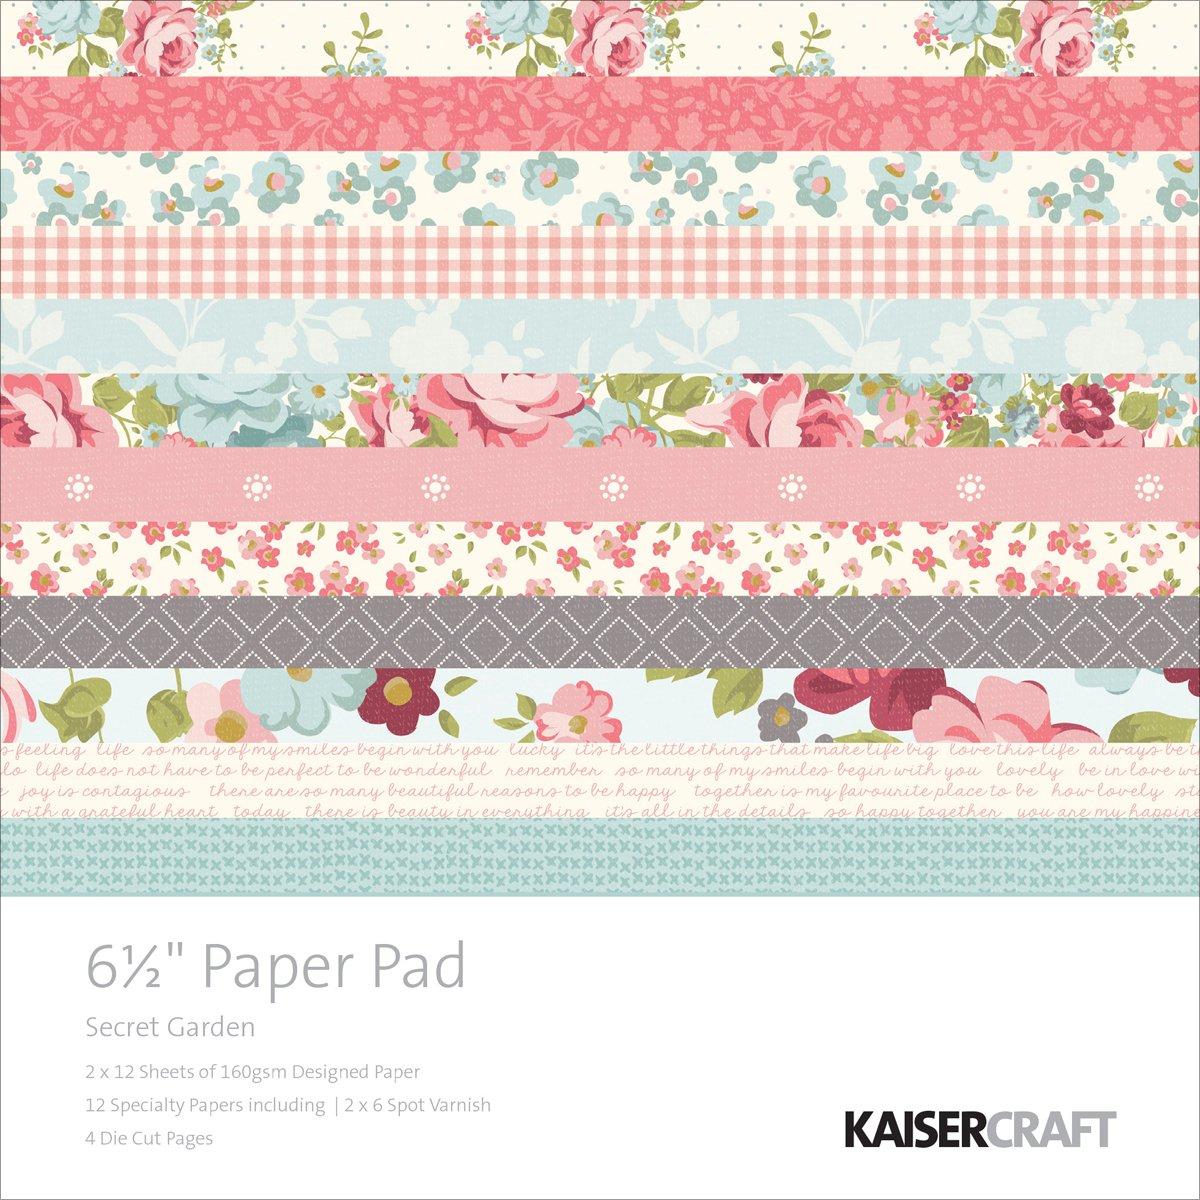 Kaiser Craft 6,5 Little One Papier Pad B00W8HFKA8   Spaß